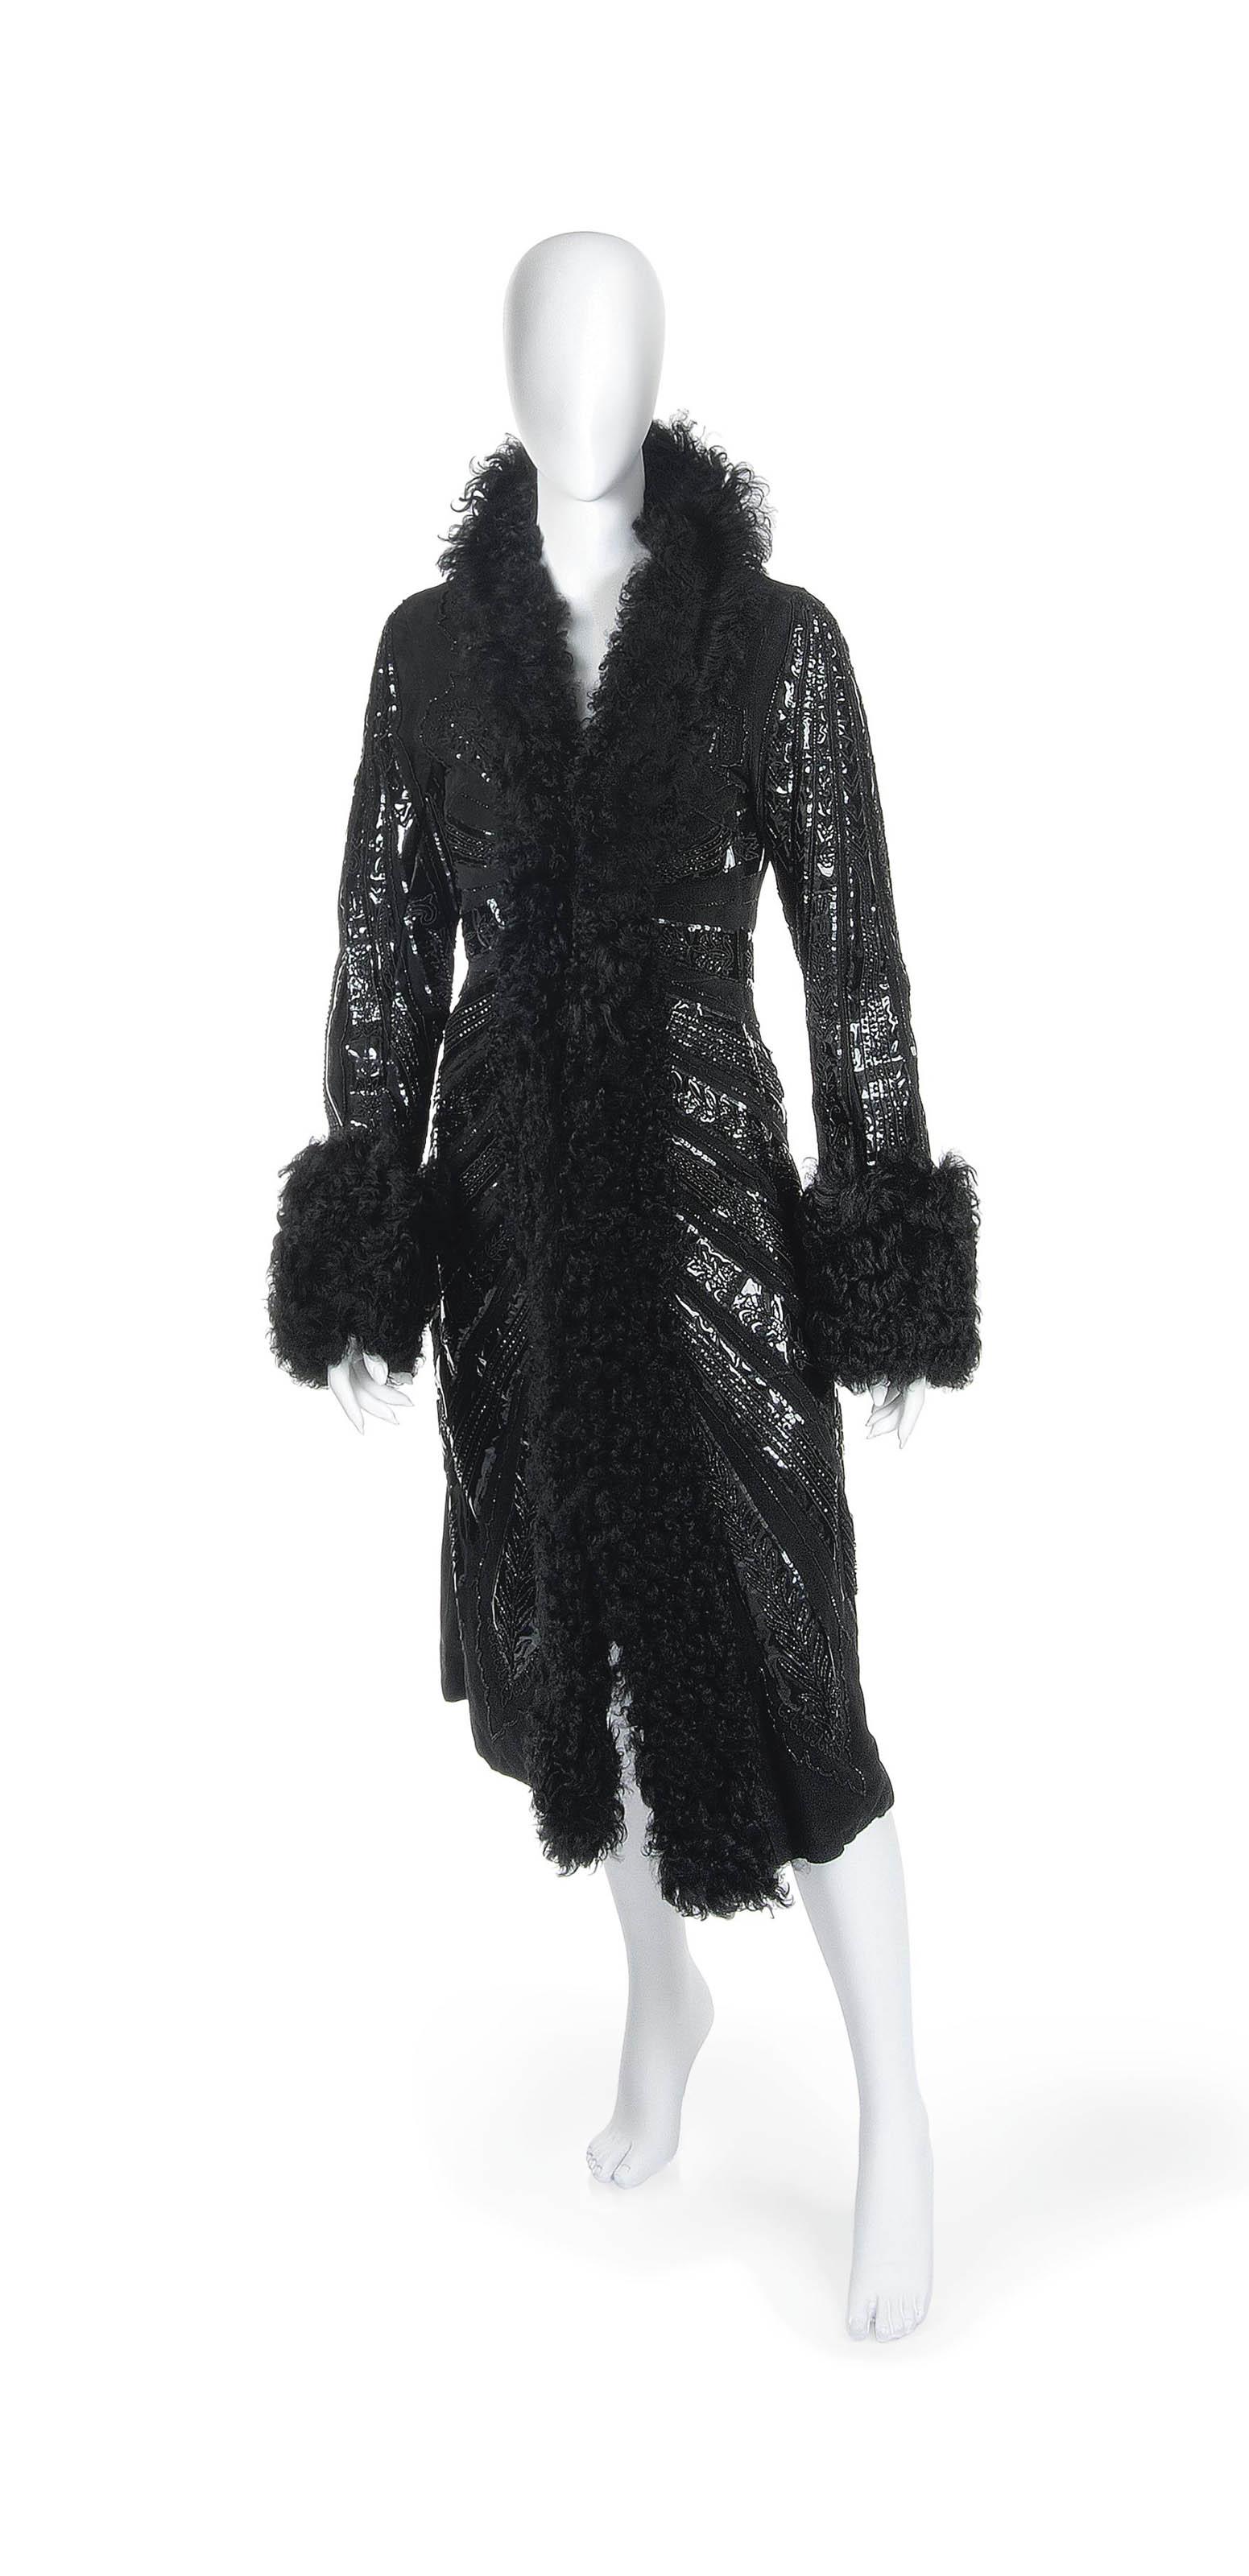 A FULL LENGTH BLACK SUEDE COAT WITH BLACK FUR TRIM